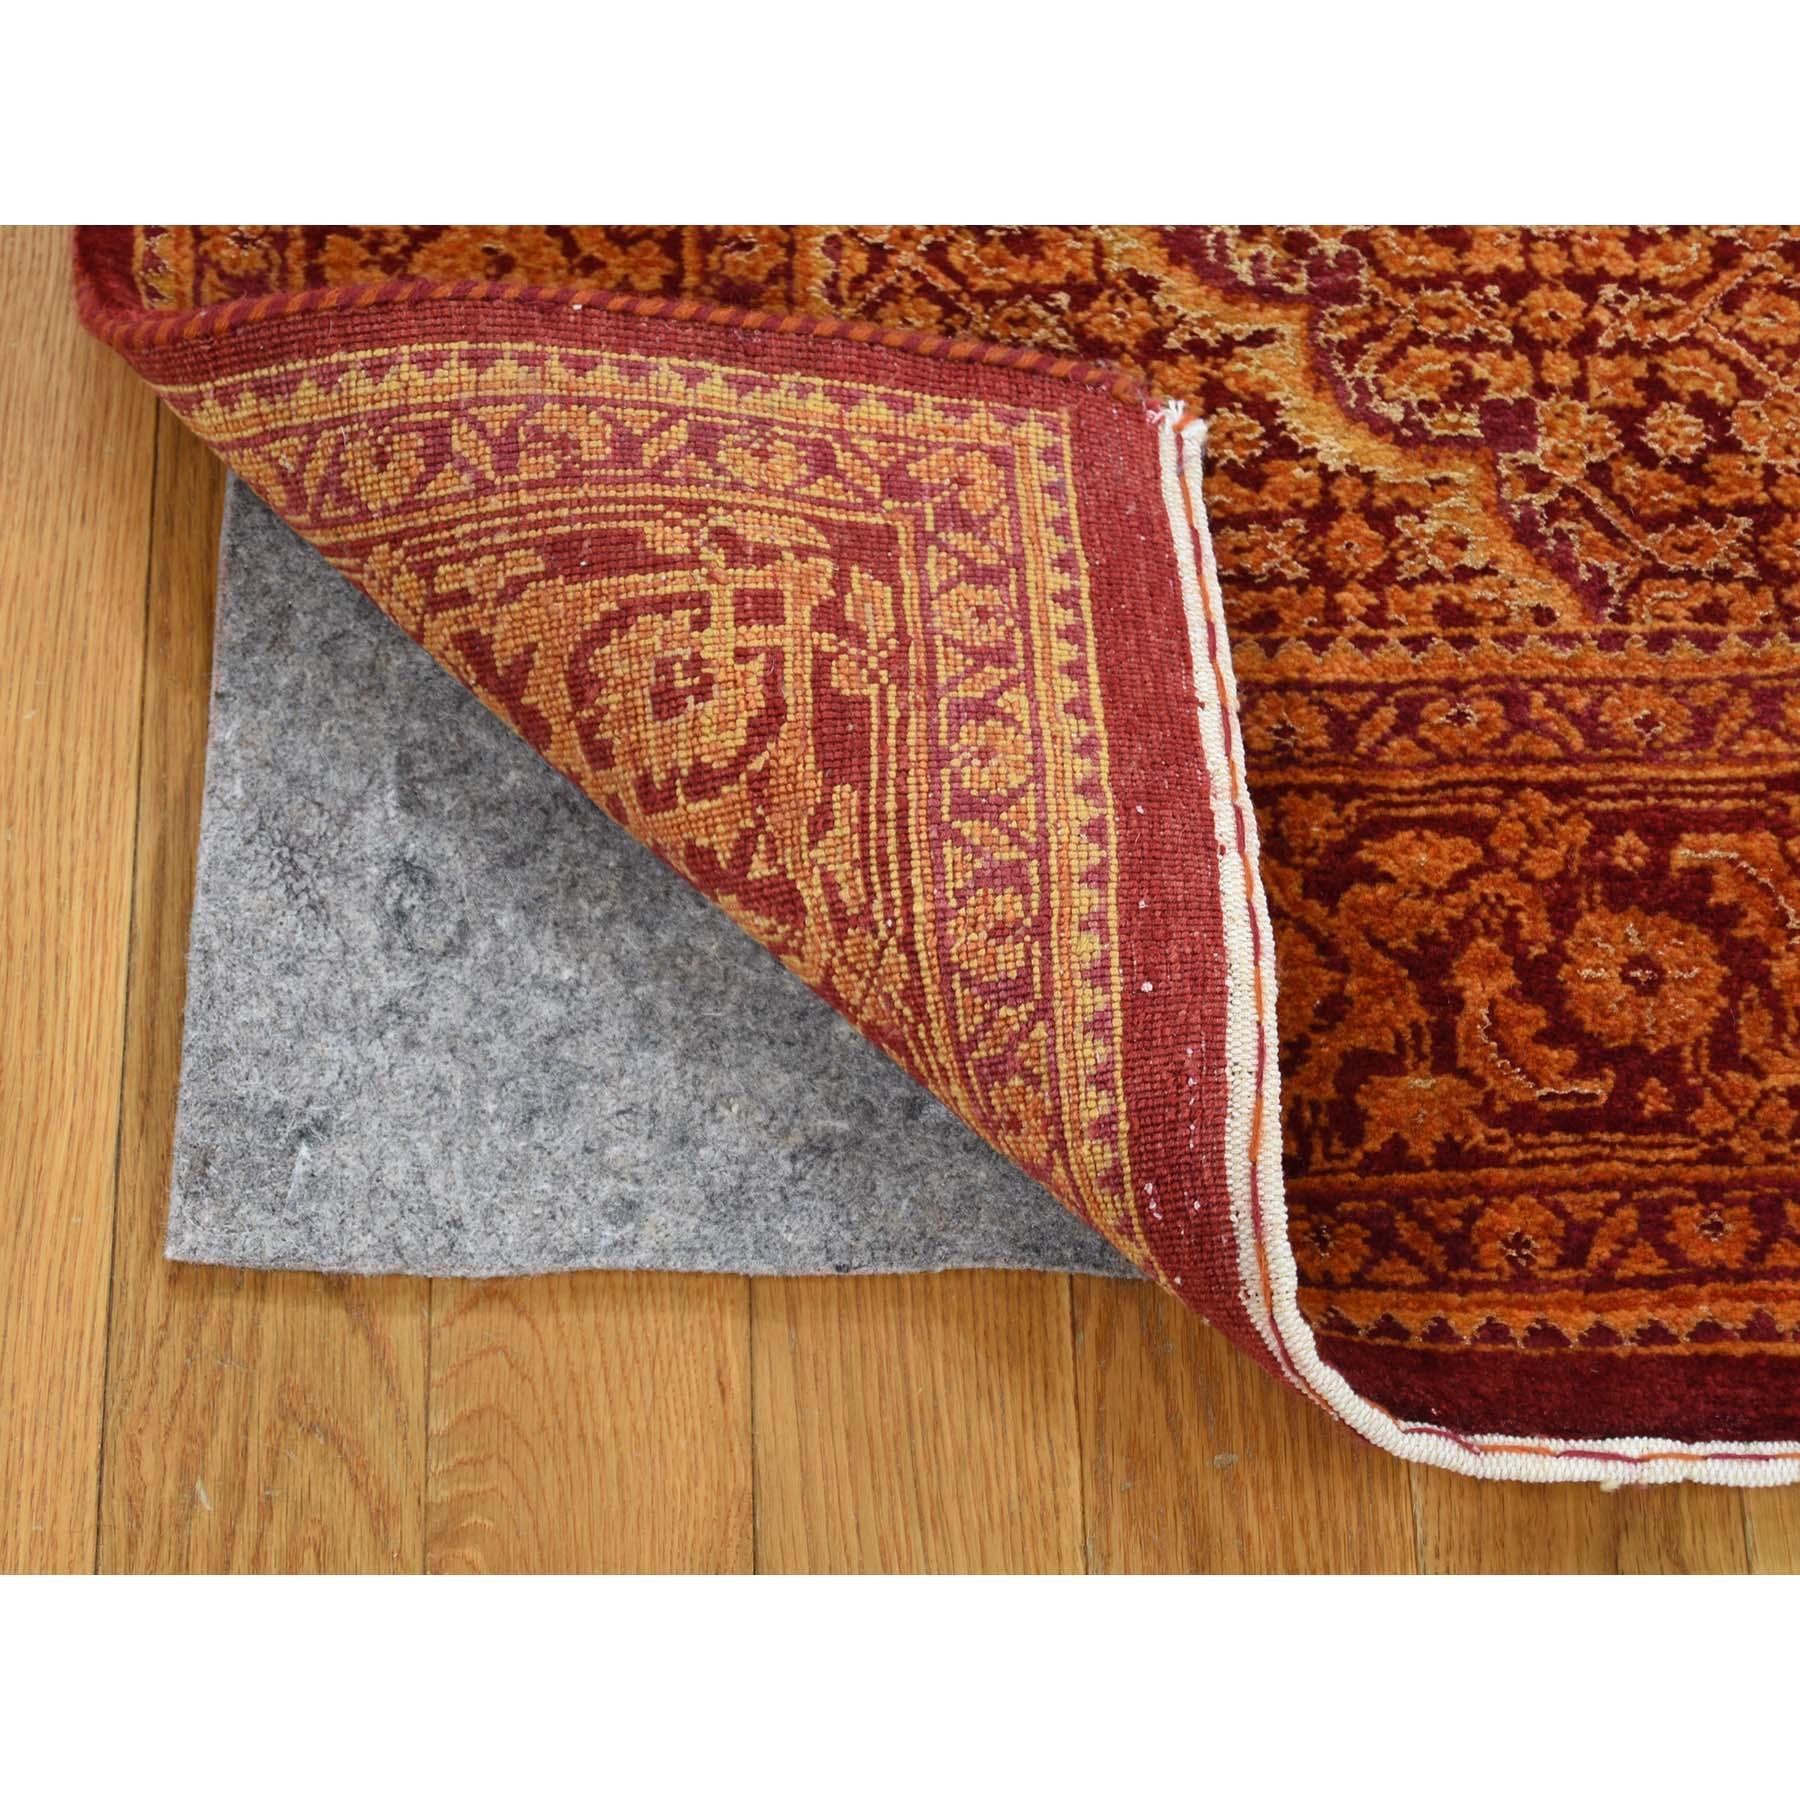 5-x7- Wool and Silk Tone on Tone Tabriz Mahi Hand Knotted Oriental Rug